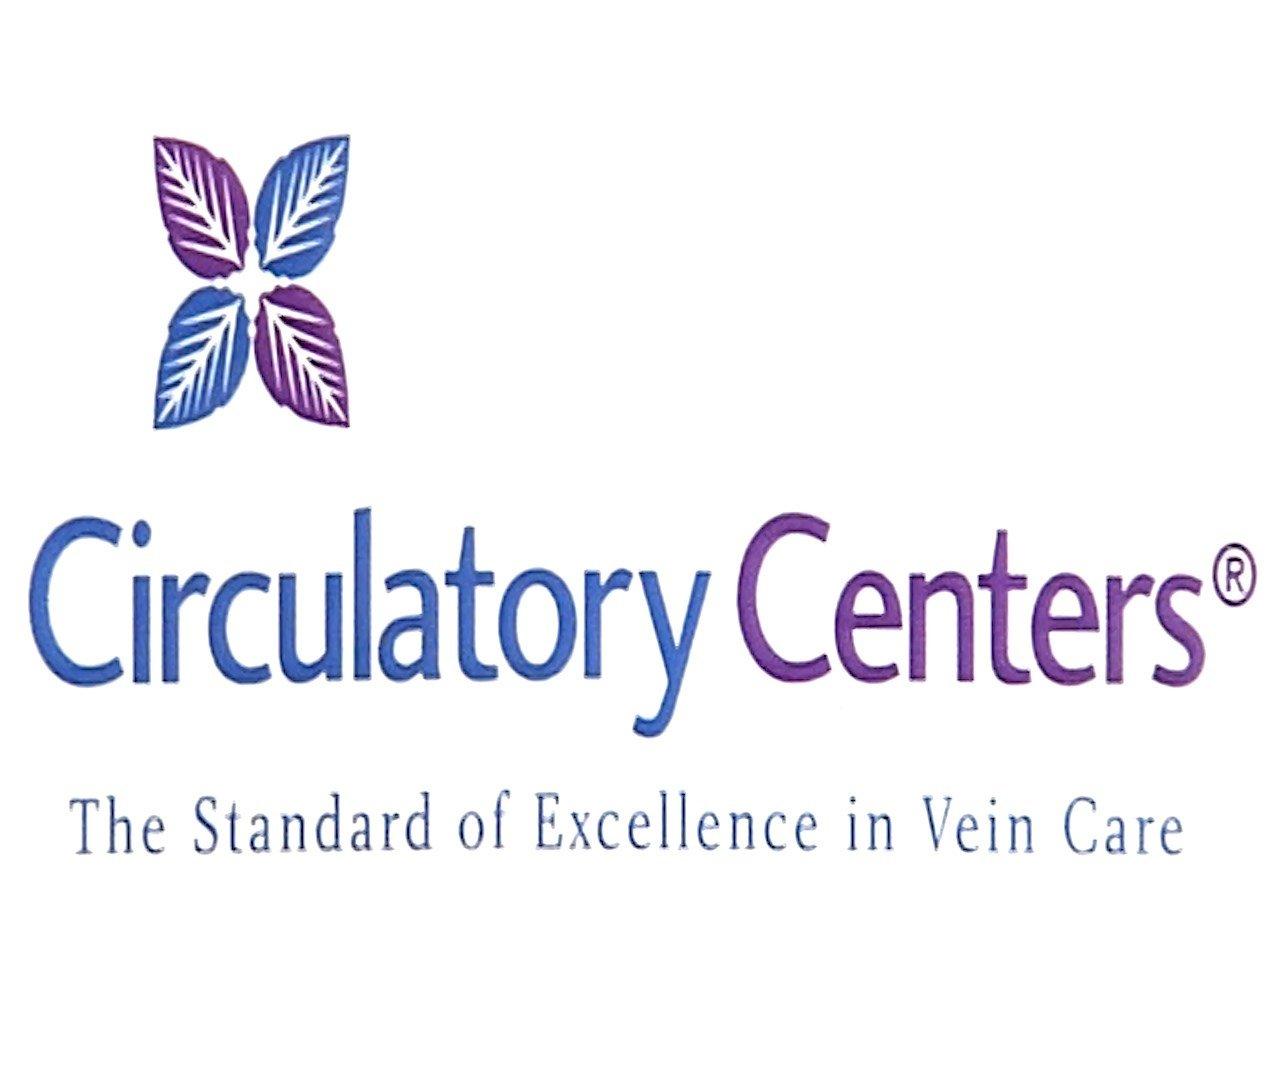 Circulatory Centers